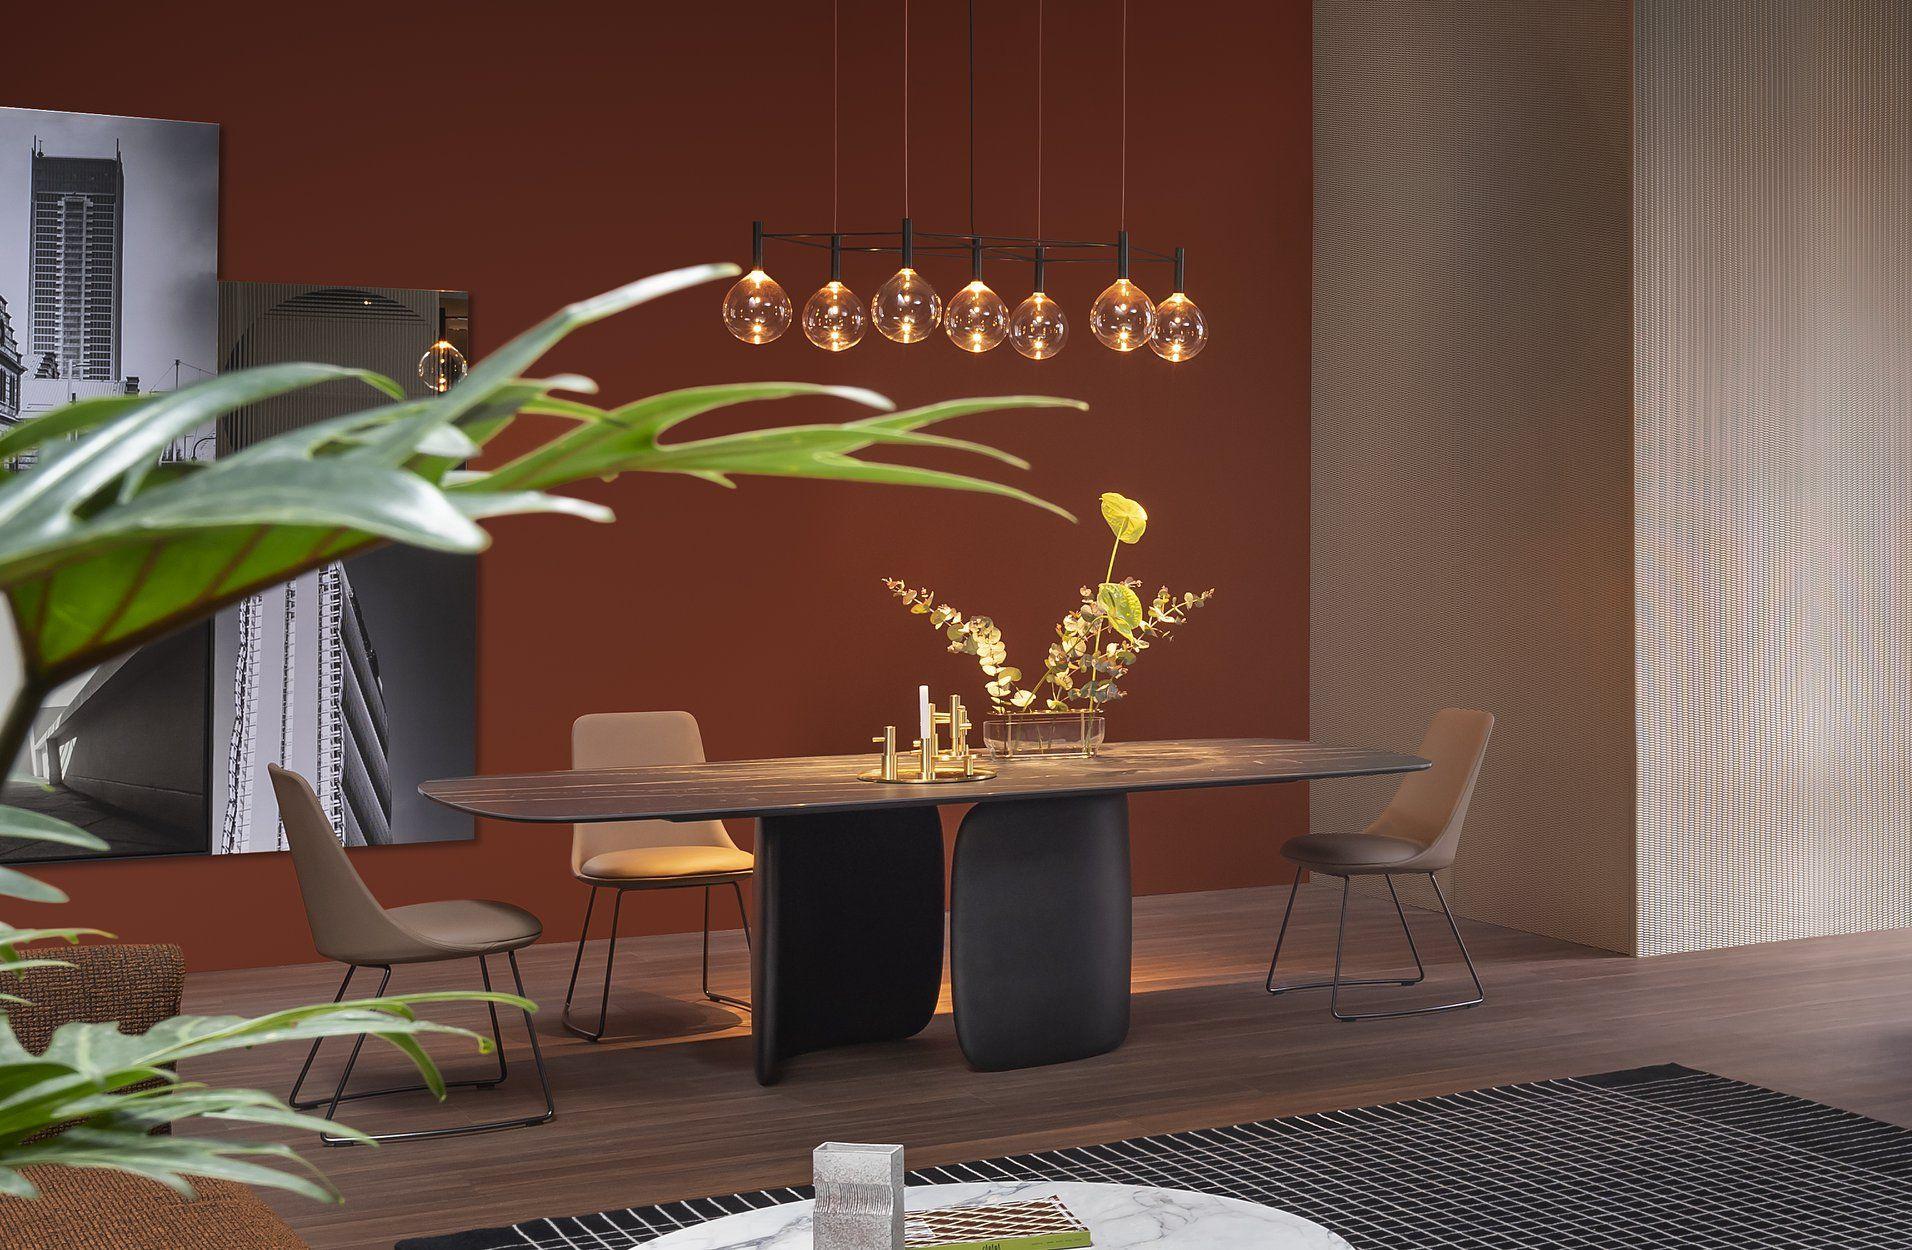 Italian Luxury Furniture Designer Furniture Singapore Da Vinci Lifestyle Modern Dining Table Dining Table Dining Room Design Modern